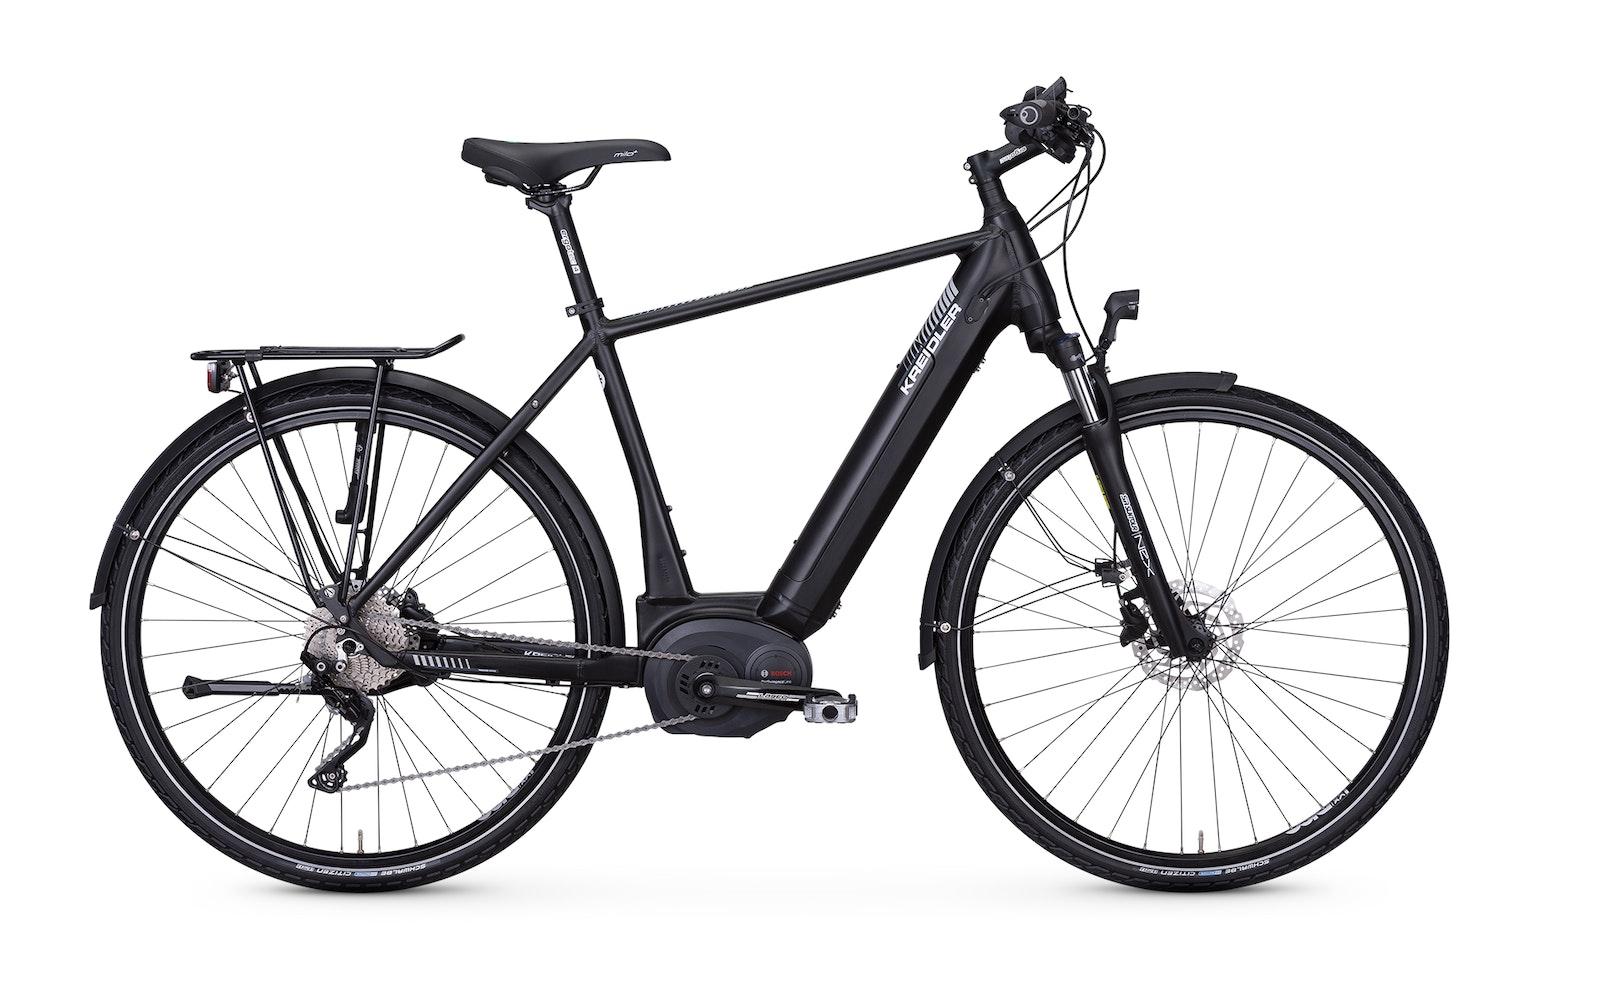 kreidler vitality eco 8 2019 102174877 bikeexchange. Black Bedroom Furniture Sets. Home Design Ideas